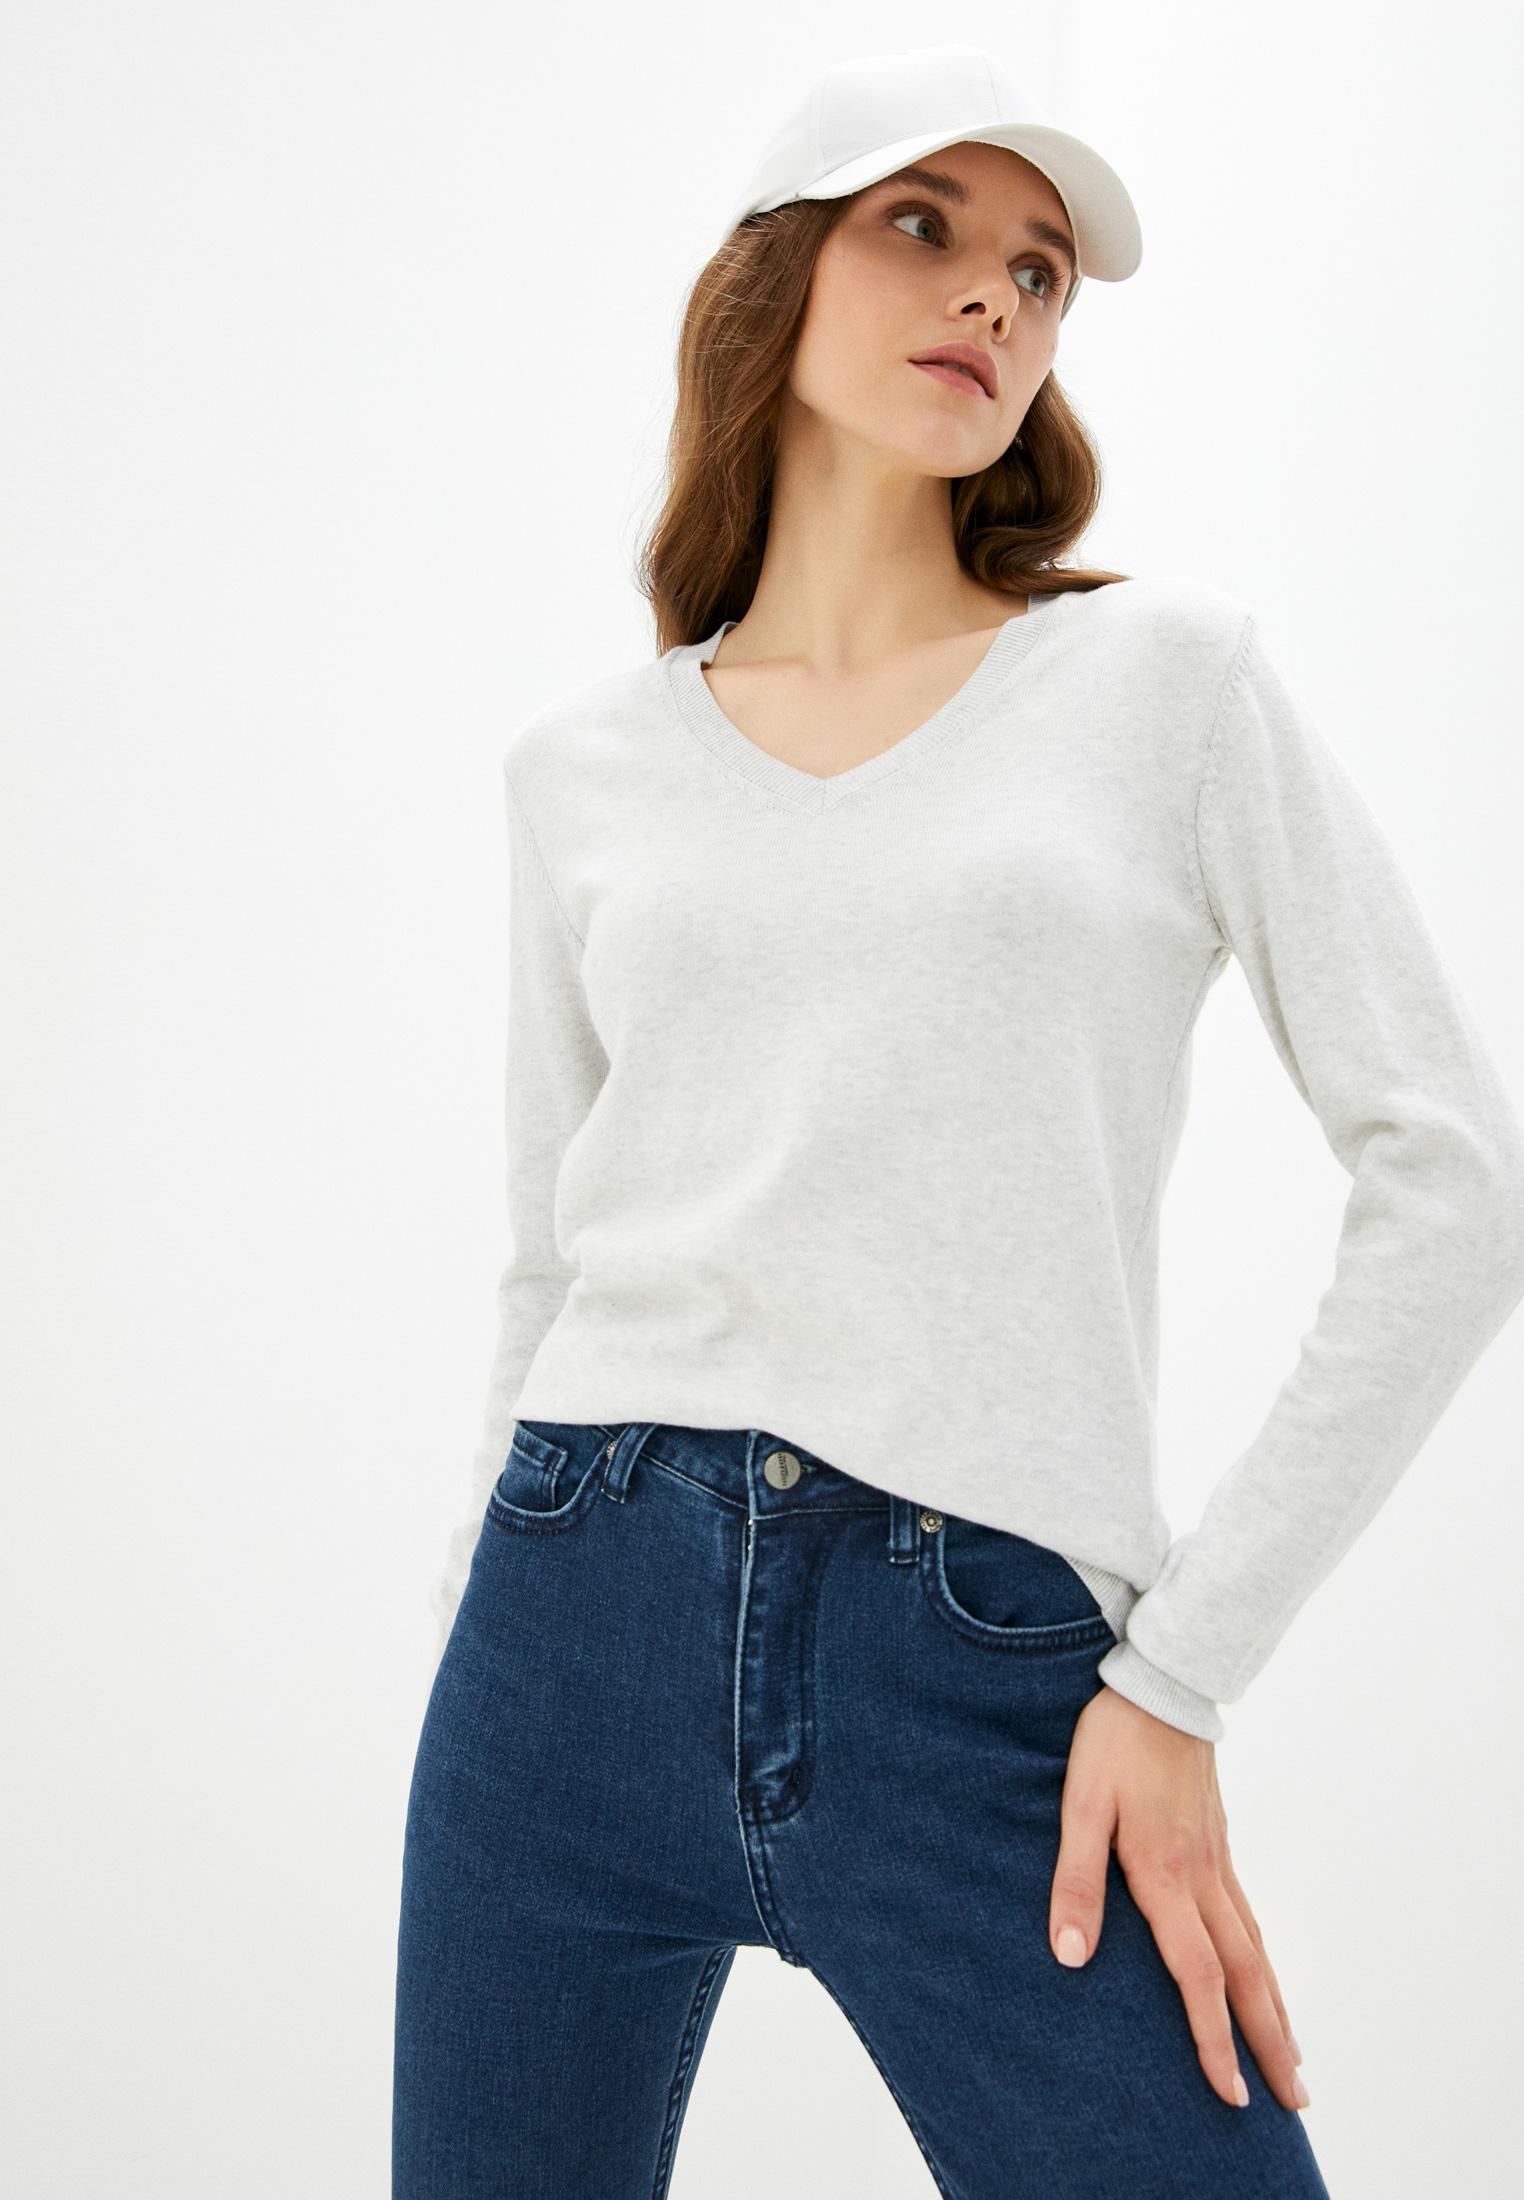 Пуловер Basics & More BA786675